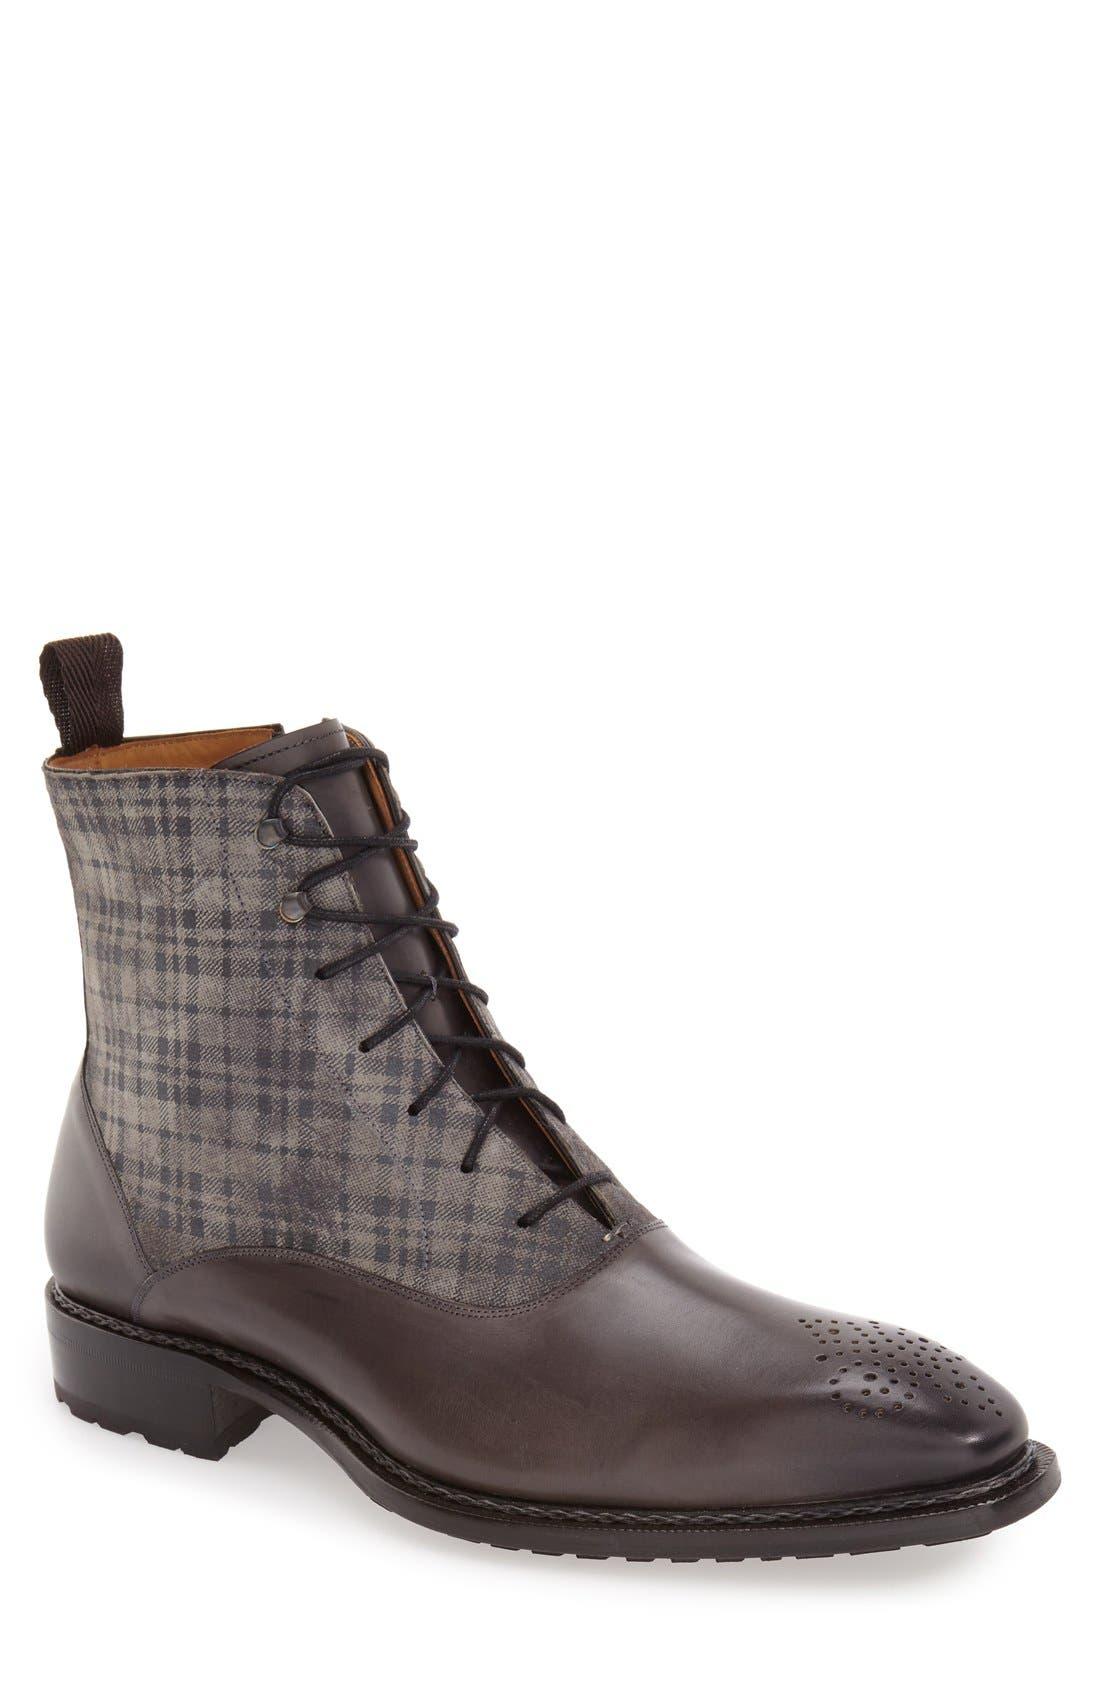 MEZLAN 'Grimaldi' Medallion Toe Fabric Shaft Boot